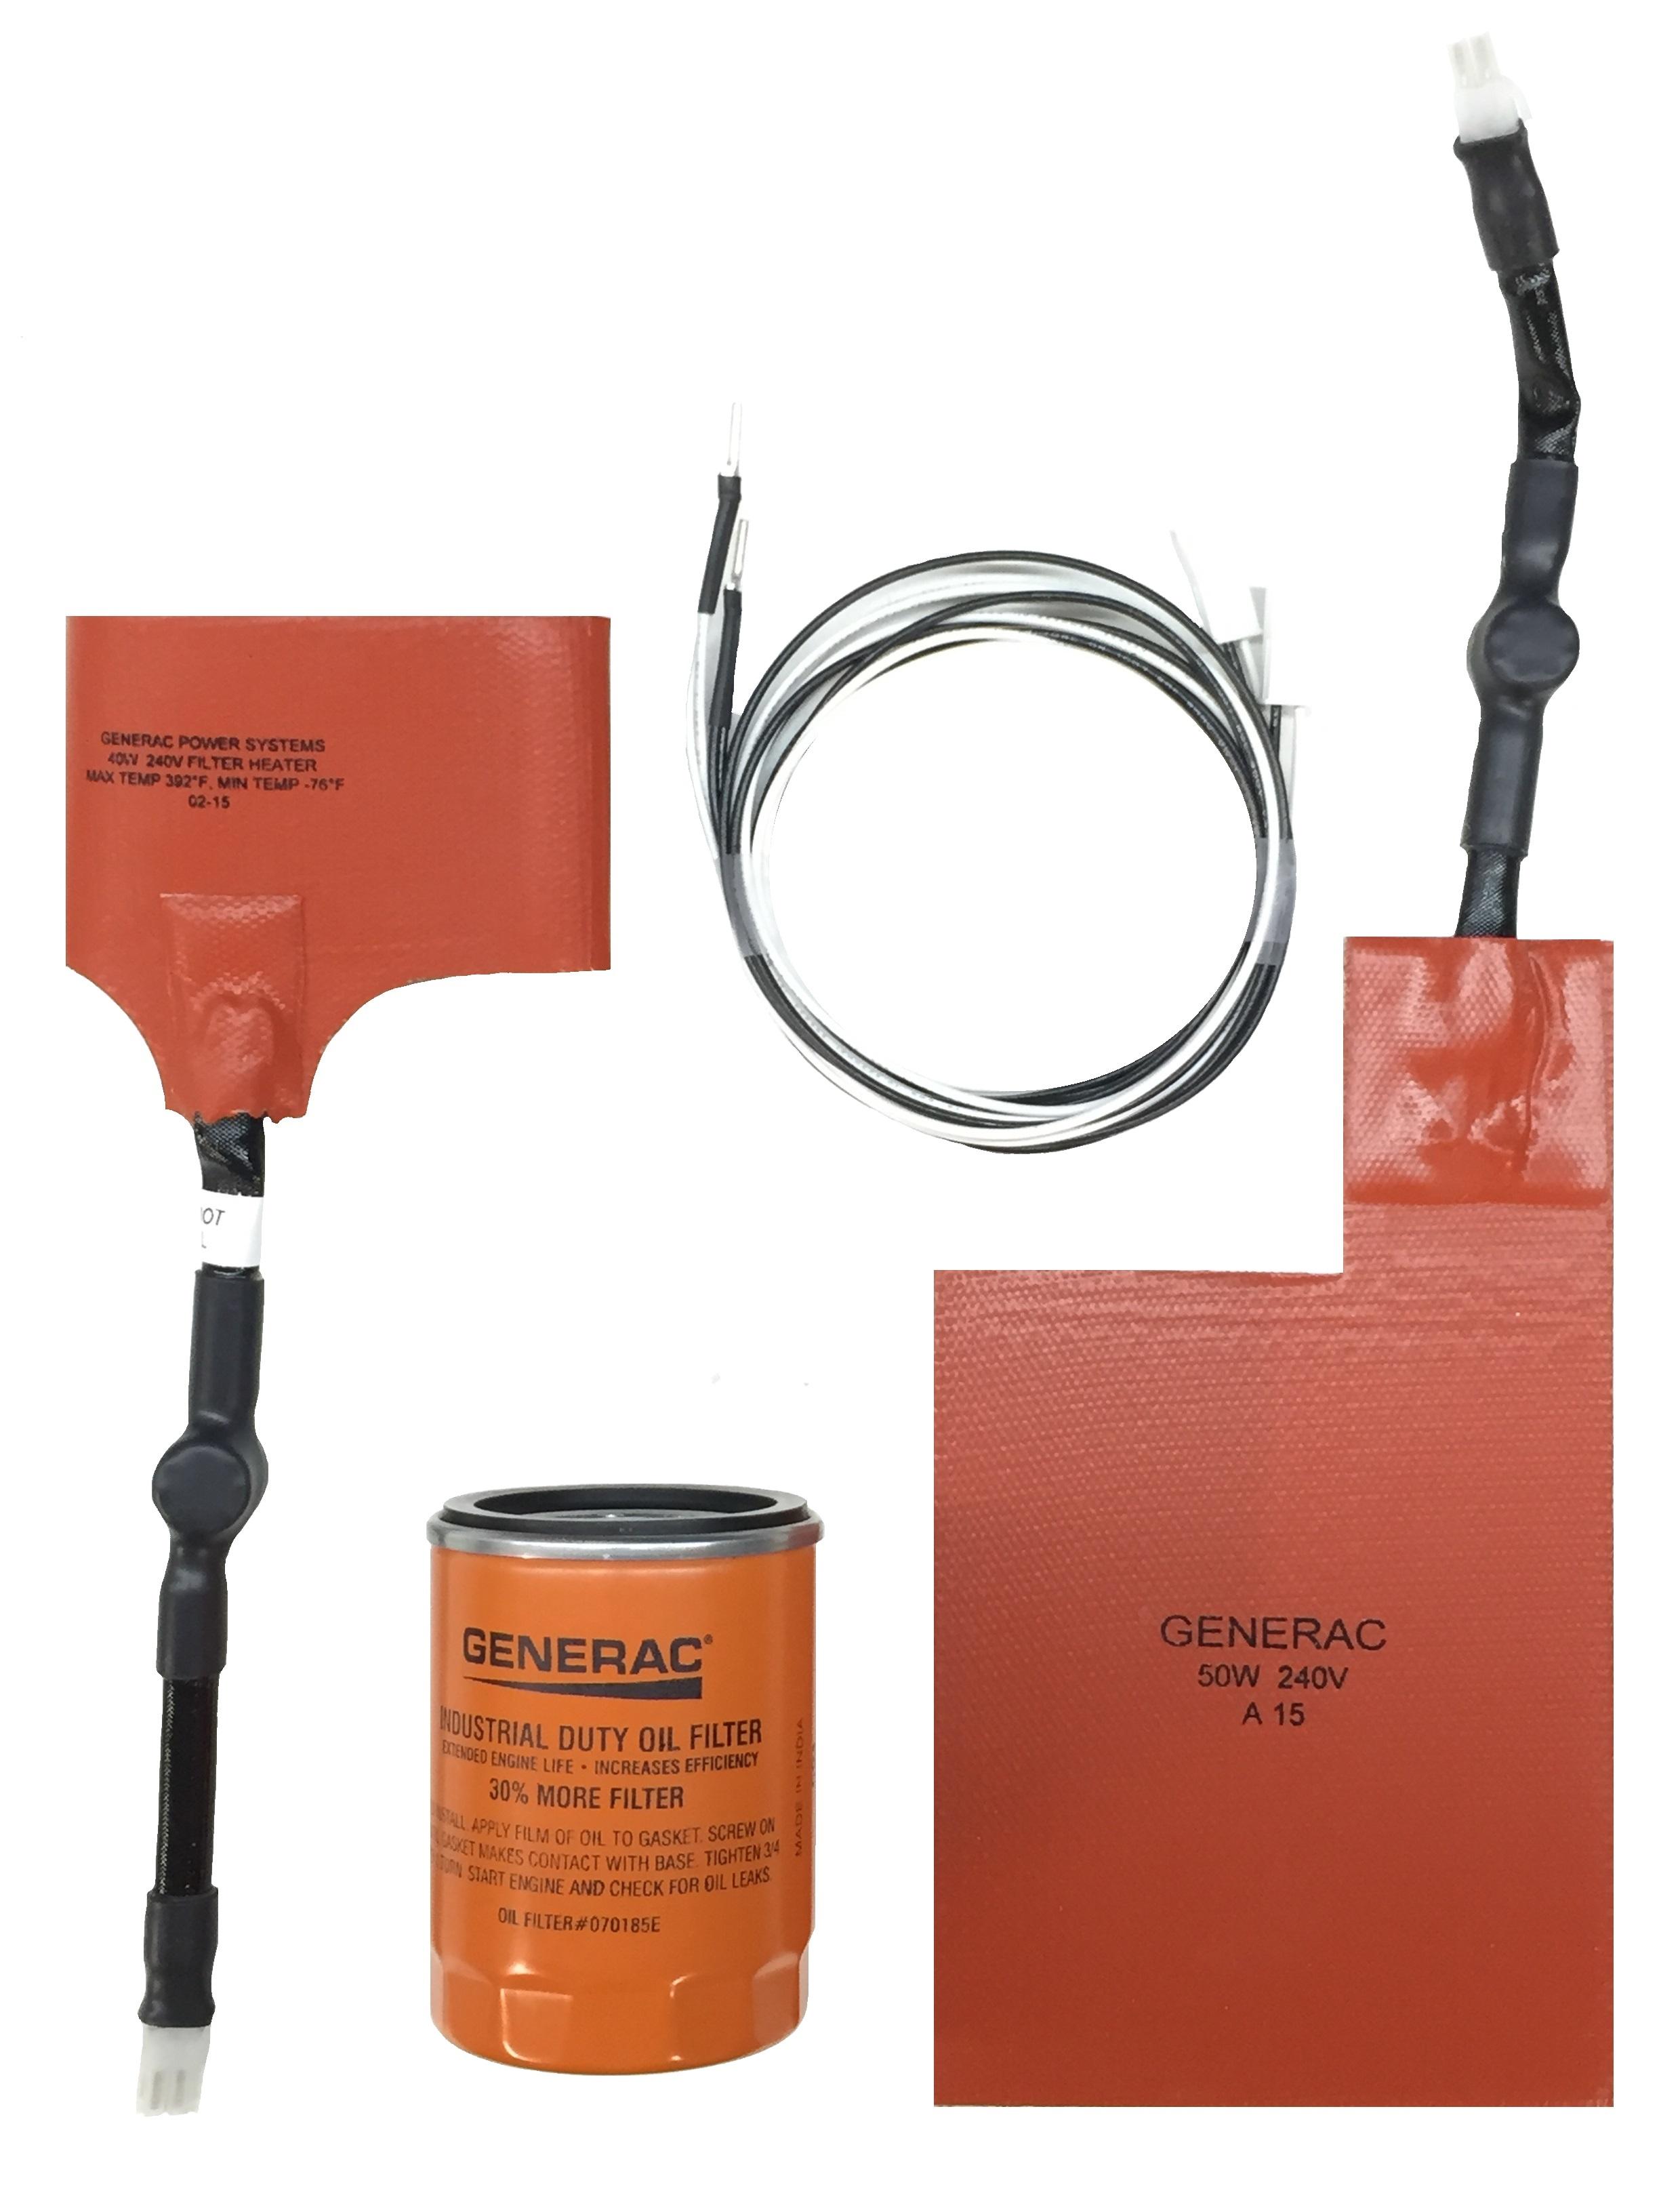 briggs and stratton elite series generator 5500 manual